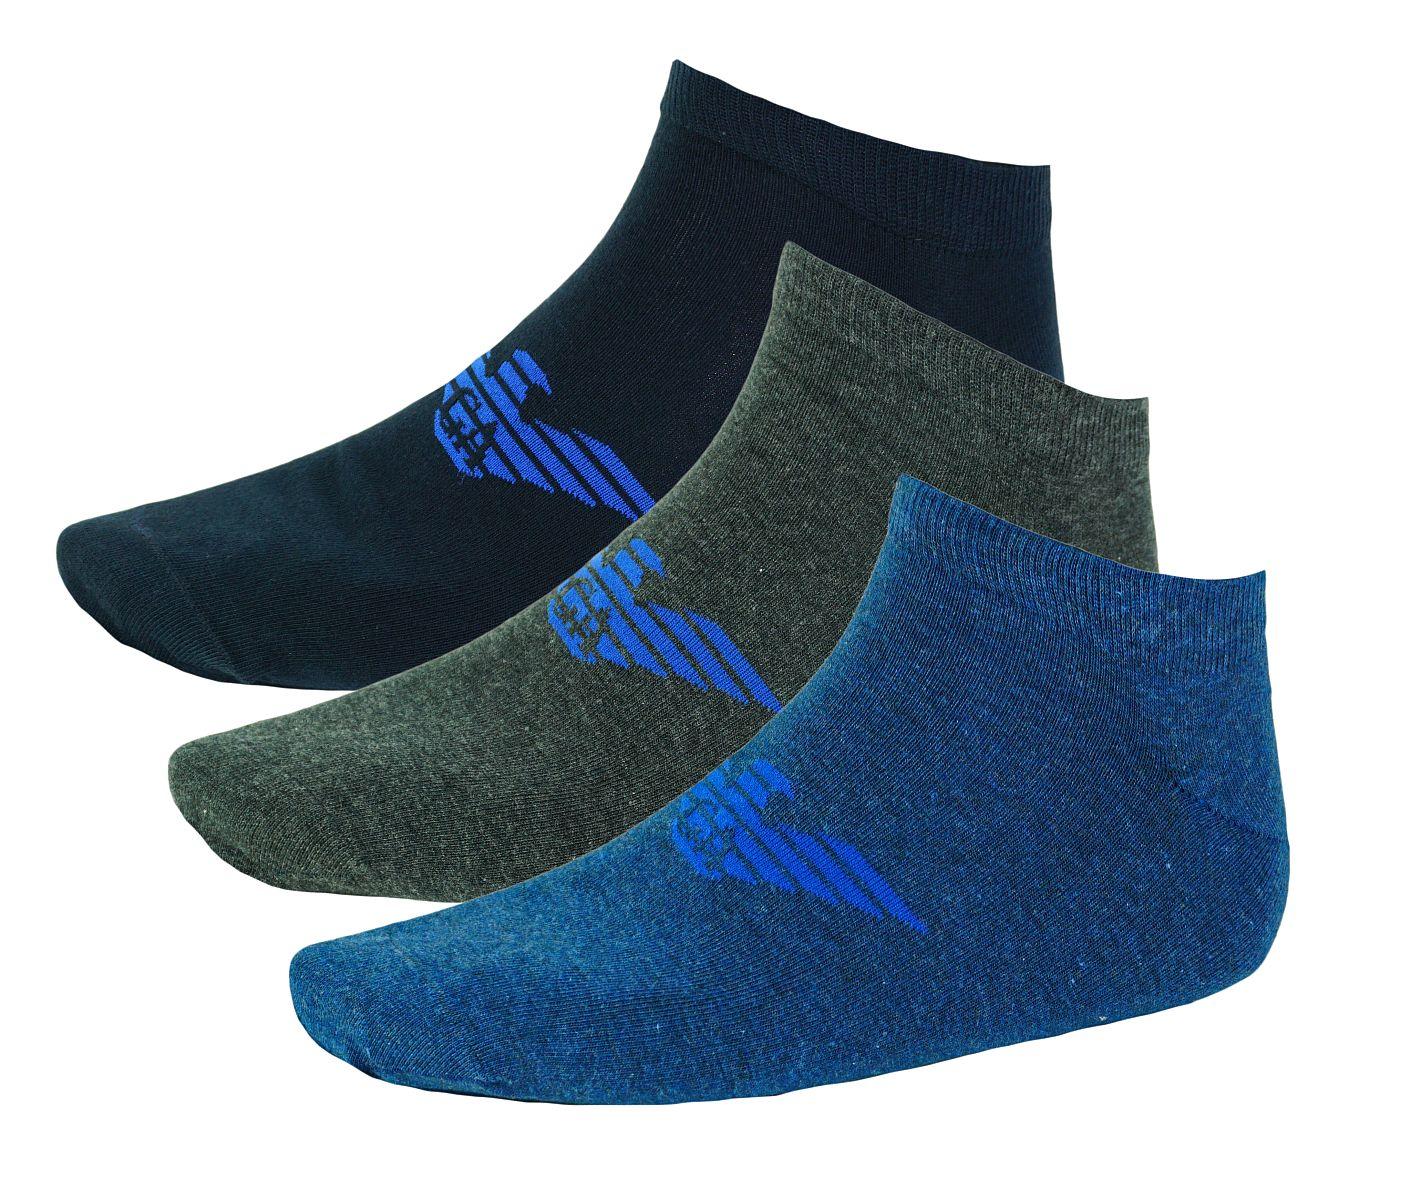 Emporio Armani 3er Pack Strümpfe Socken 8929BX Calza Inside 300008 7A234 HW17-EAX1